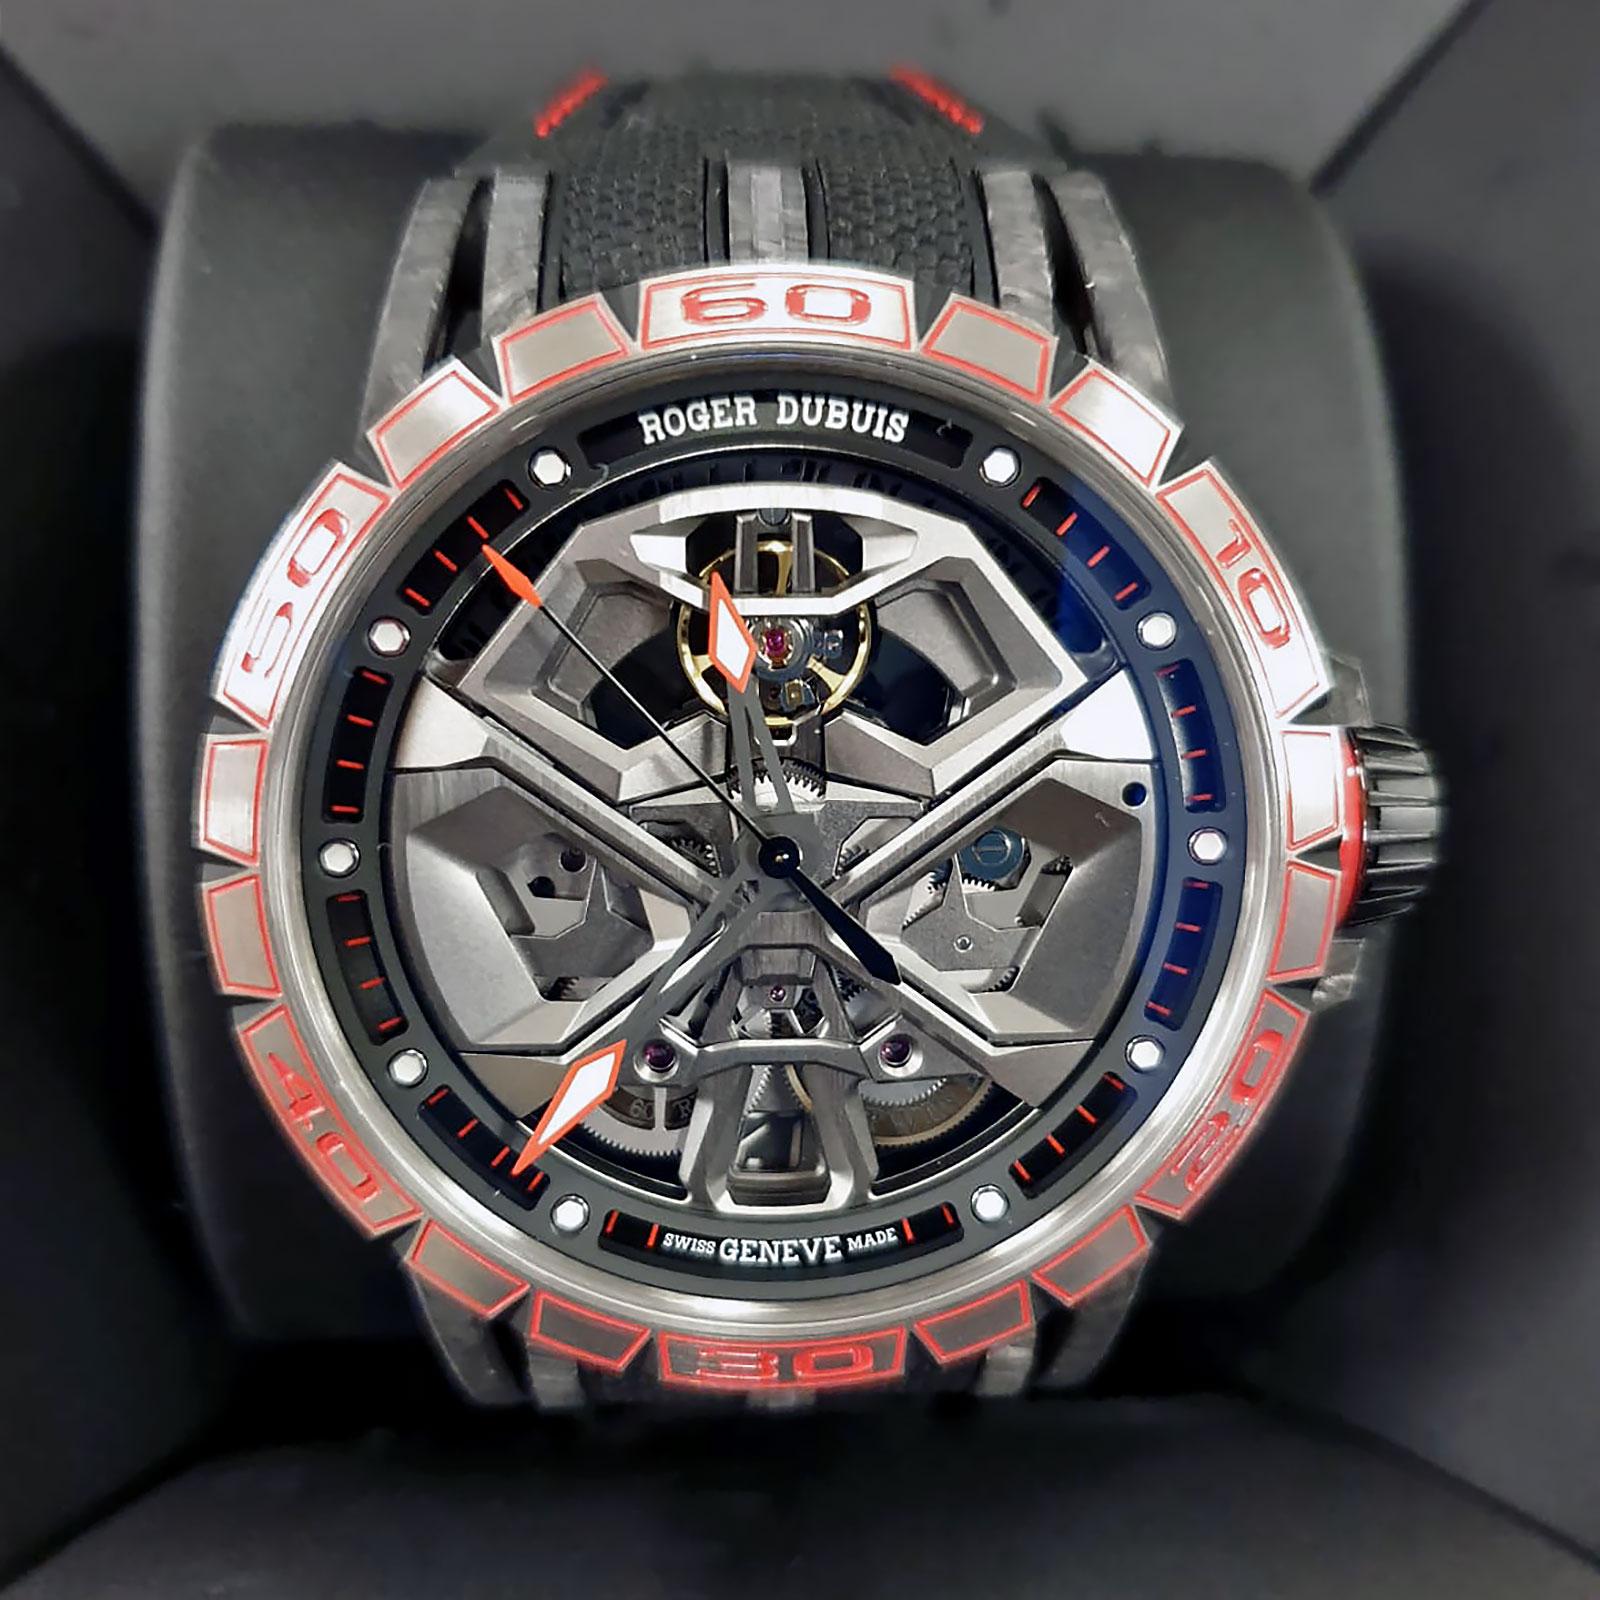 Roger Dubuis, Franck Muller, Louis Moinet Unveil Watches